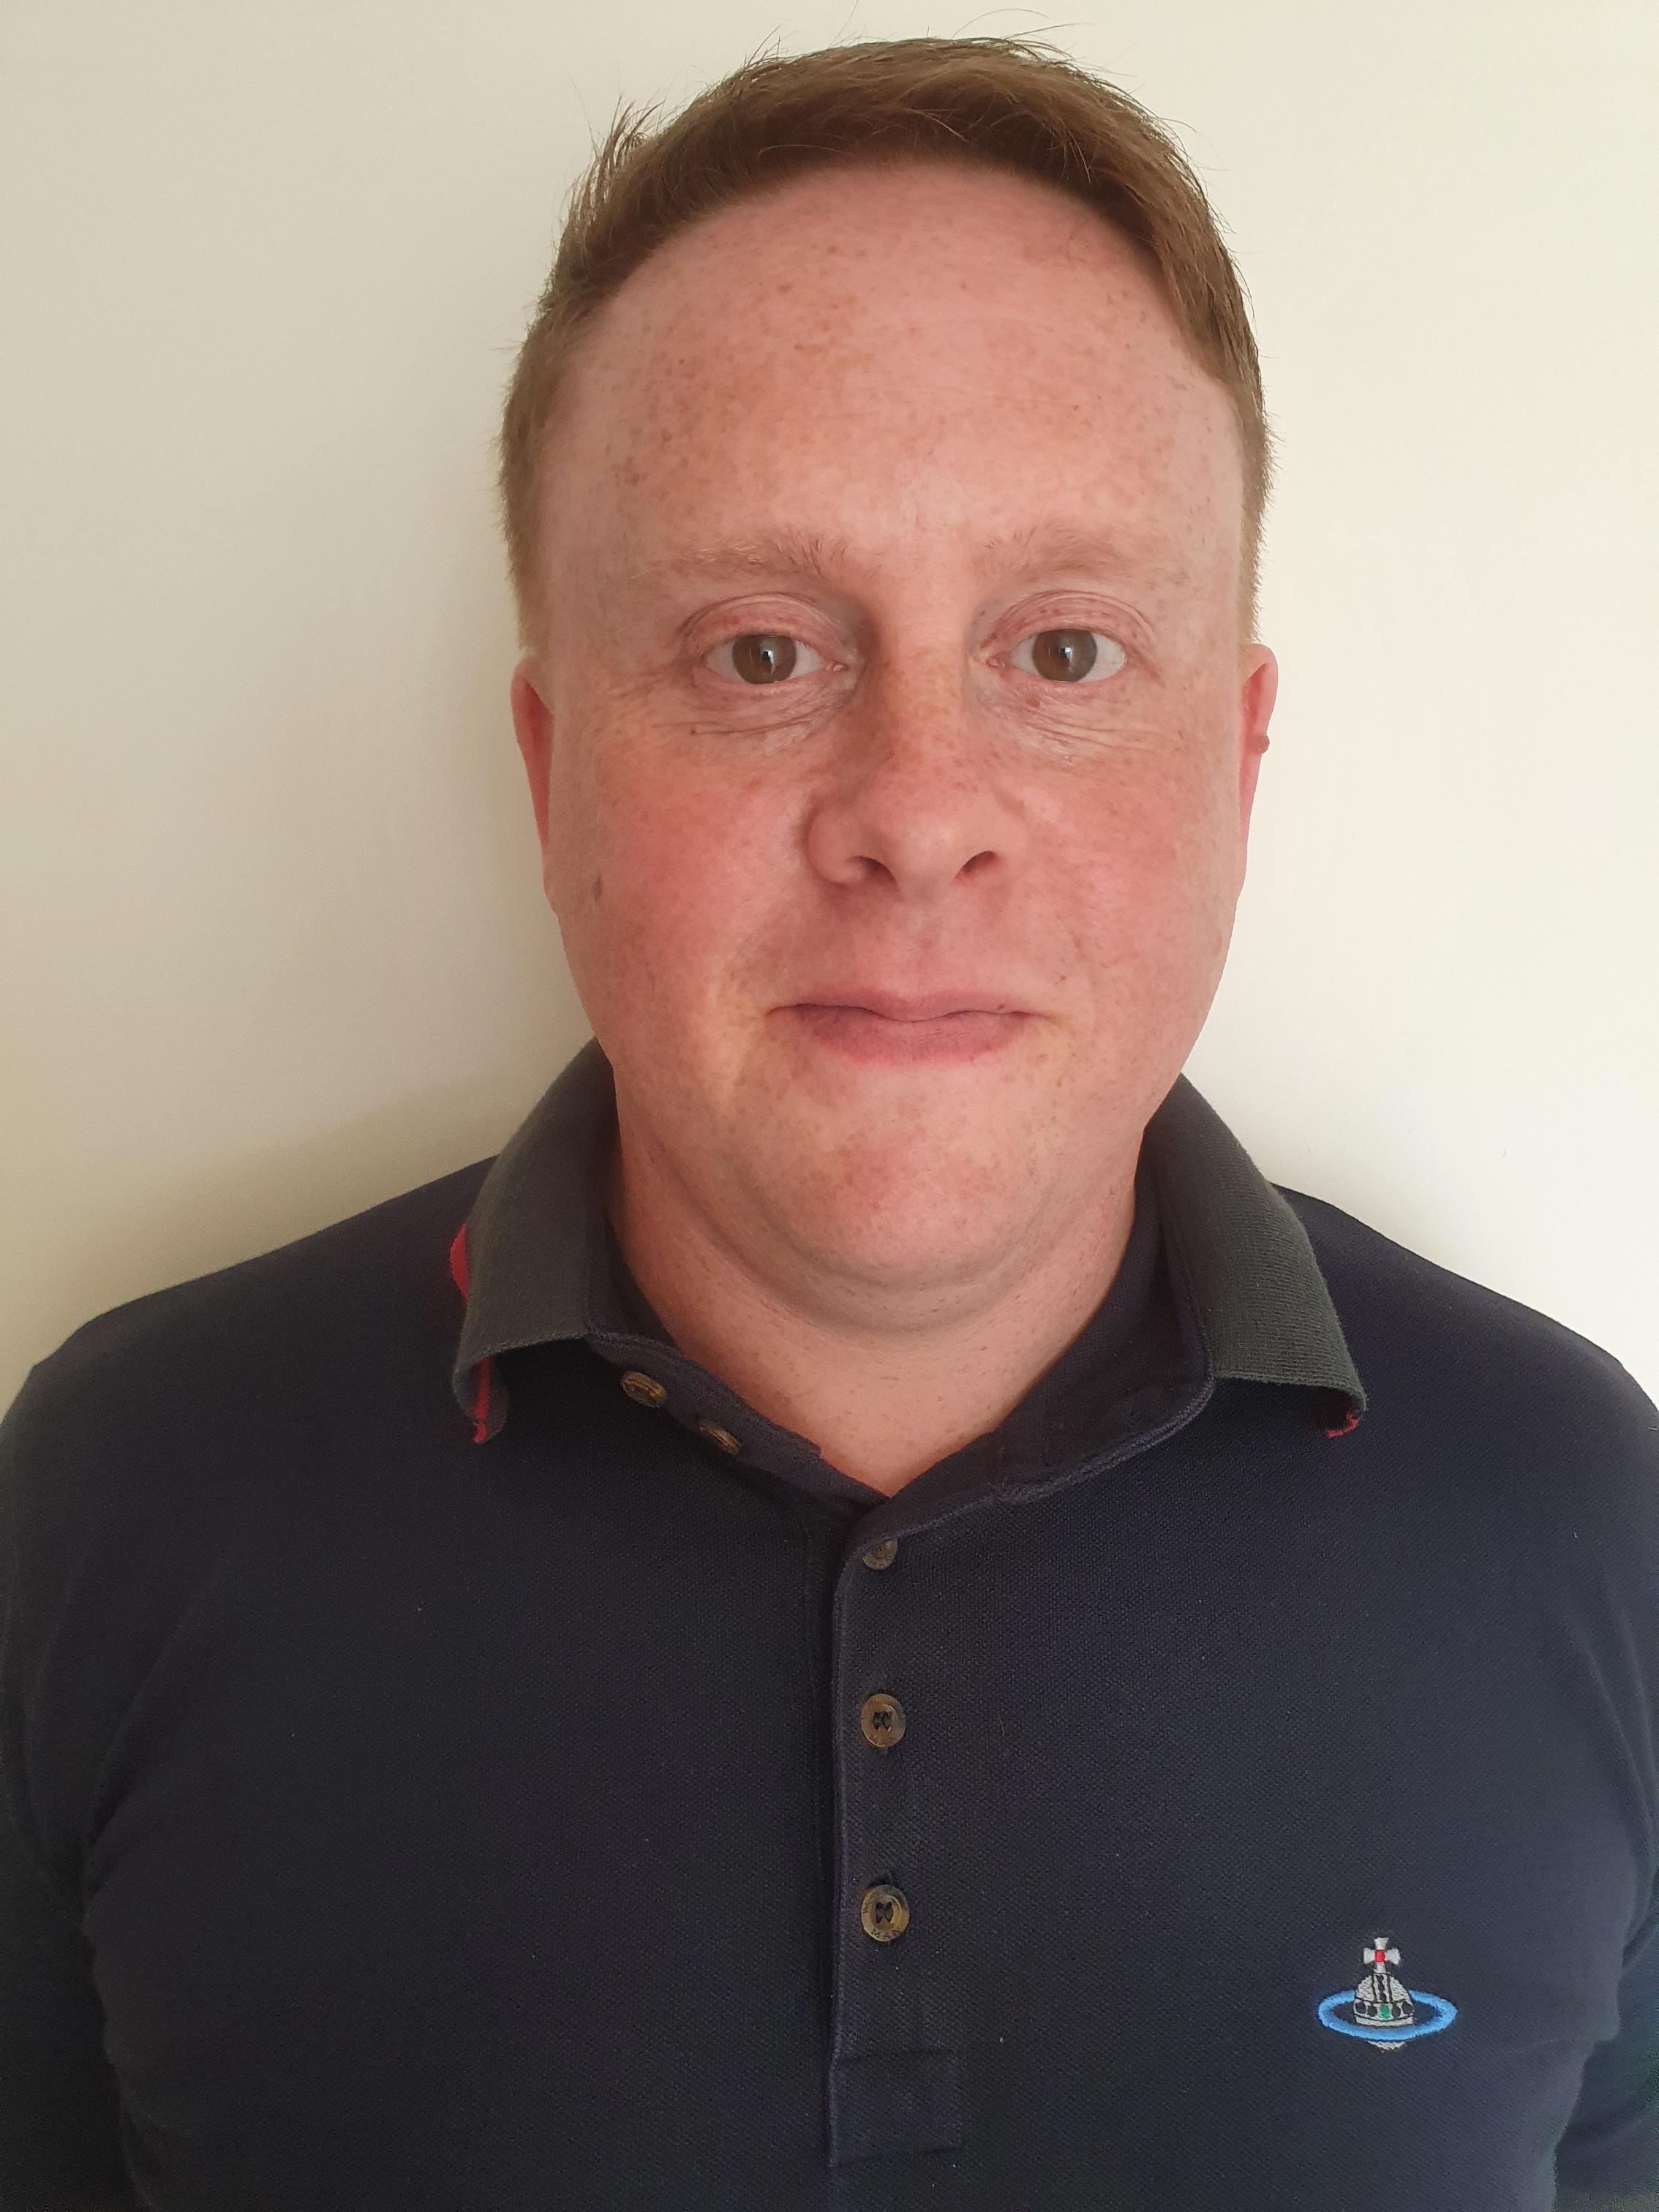 Councillor Chris Campbell